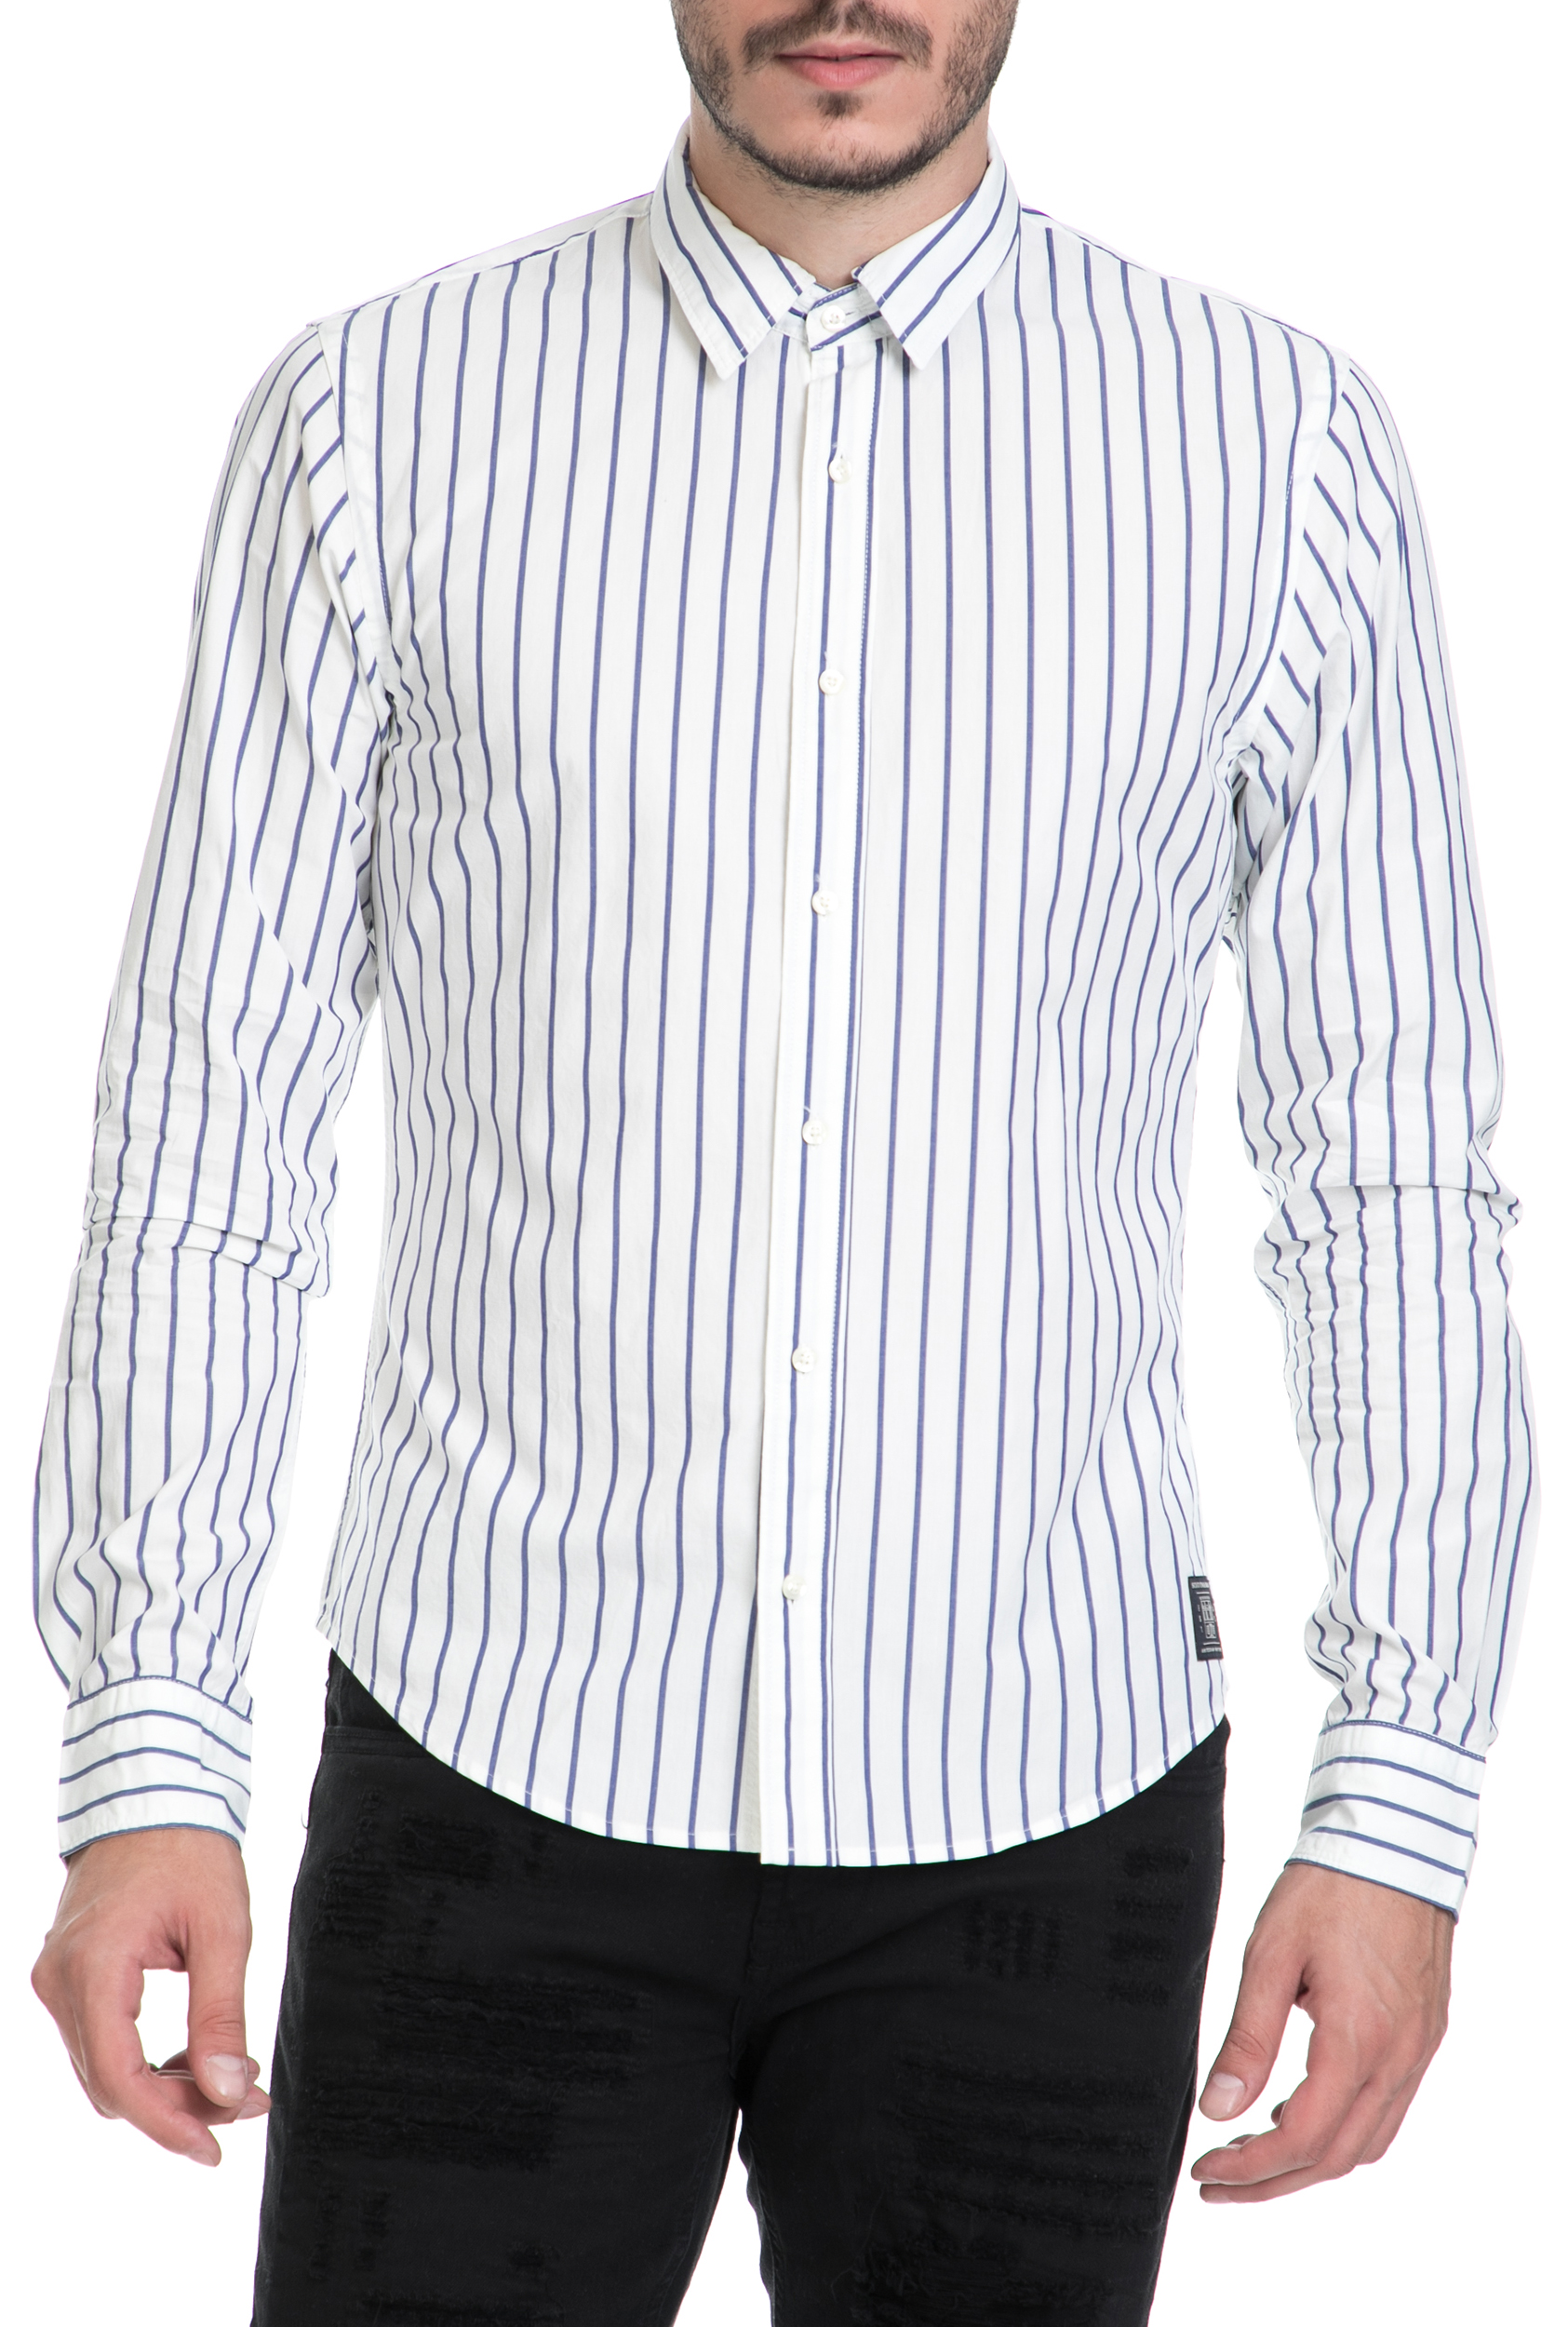 SCOTCH & SODA - Ανδρικό πουκάμισο SCOTCH & SODA λευκό-μπλε ανδρικά ρούχα πουκάμισα μακρυμάνικα